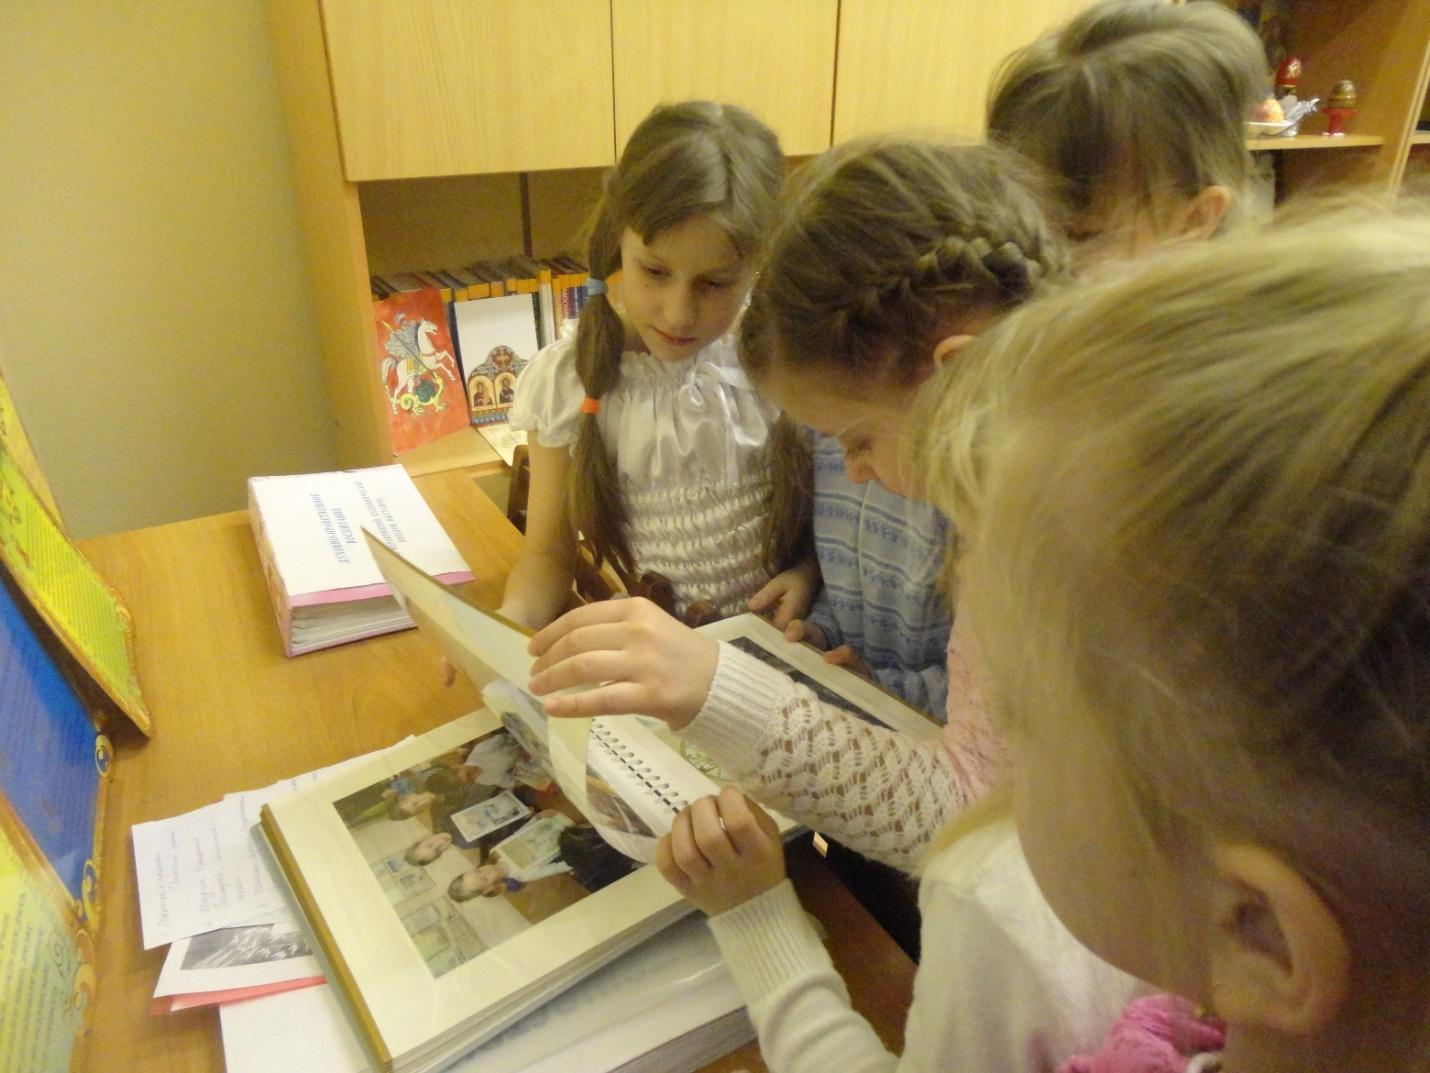 H:\Музей Магомедовой\отчет по музею - фото\DSC05674.JPG